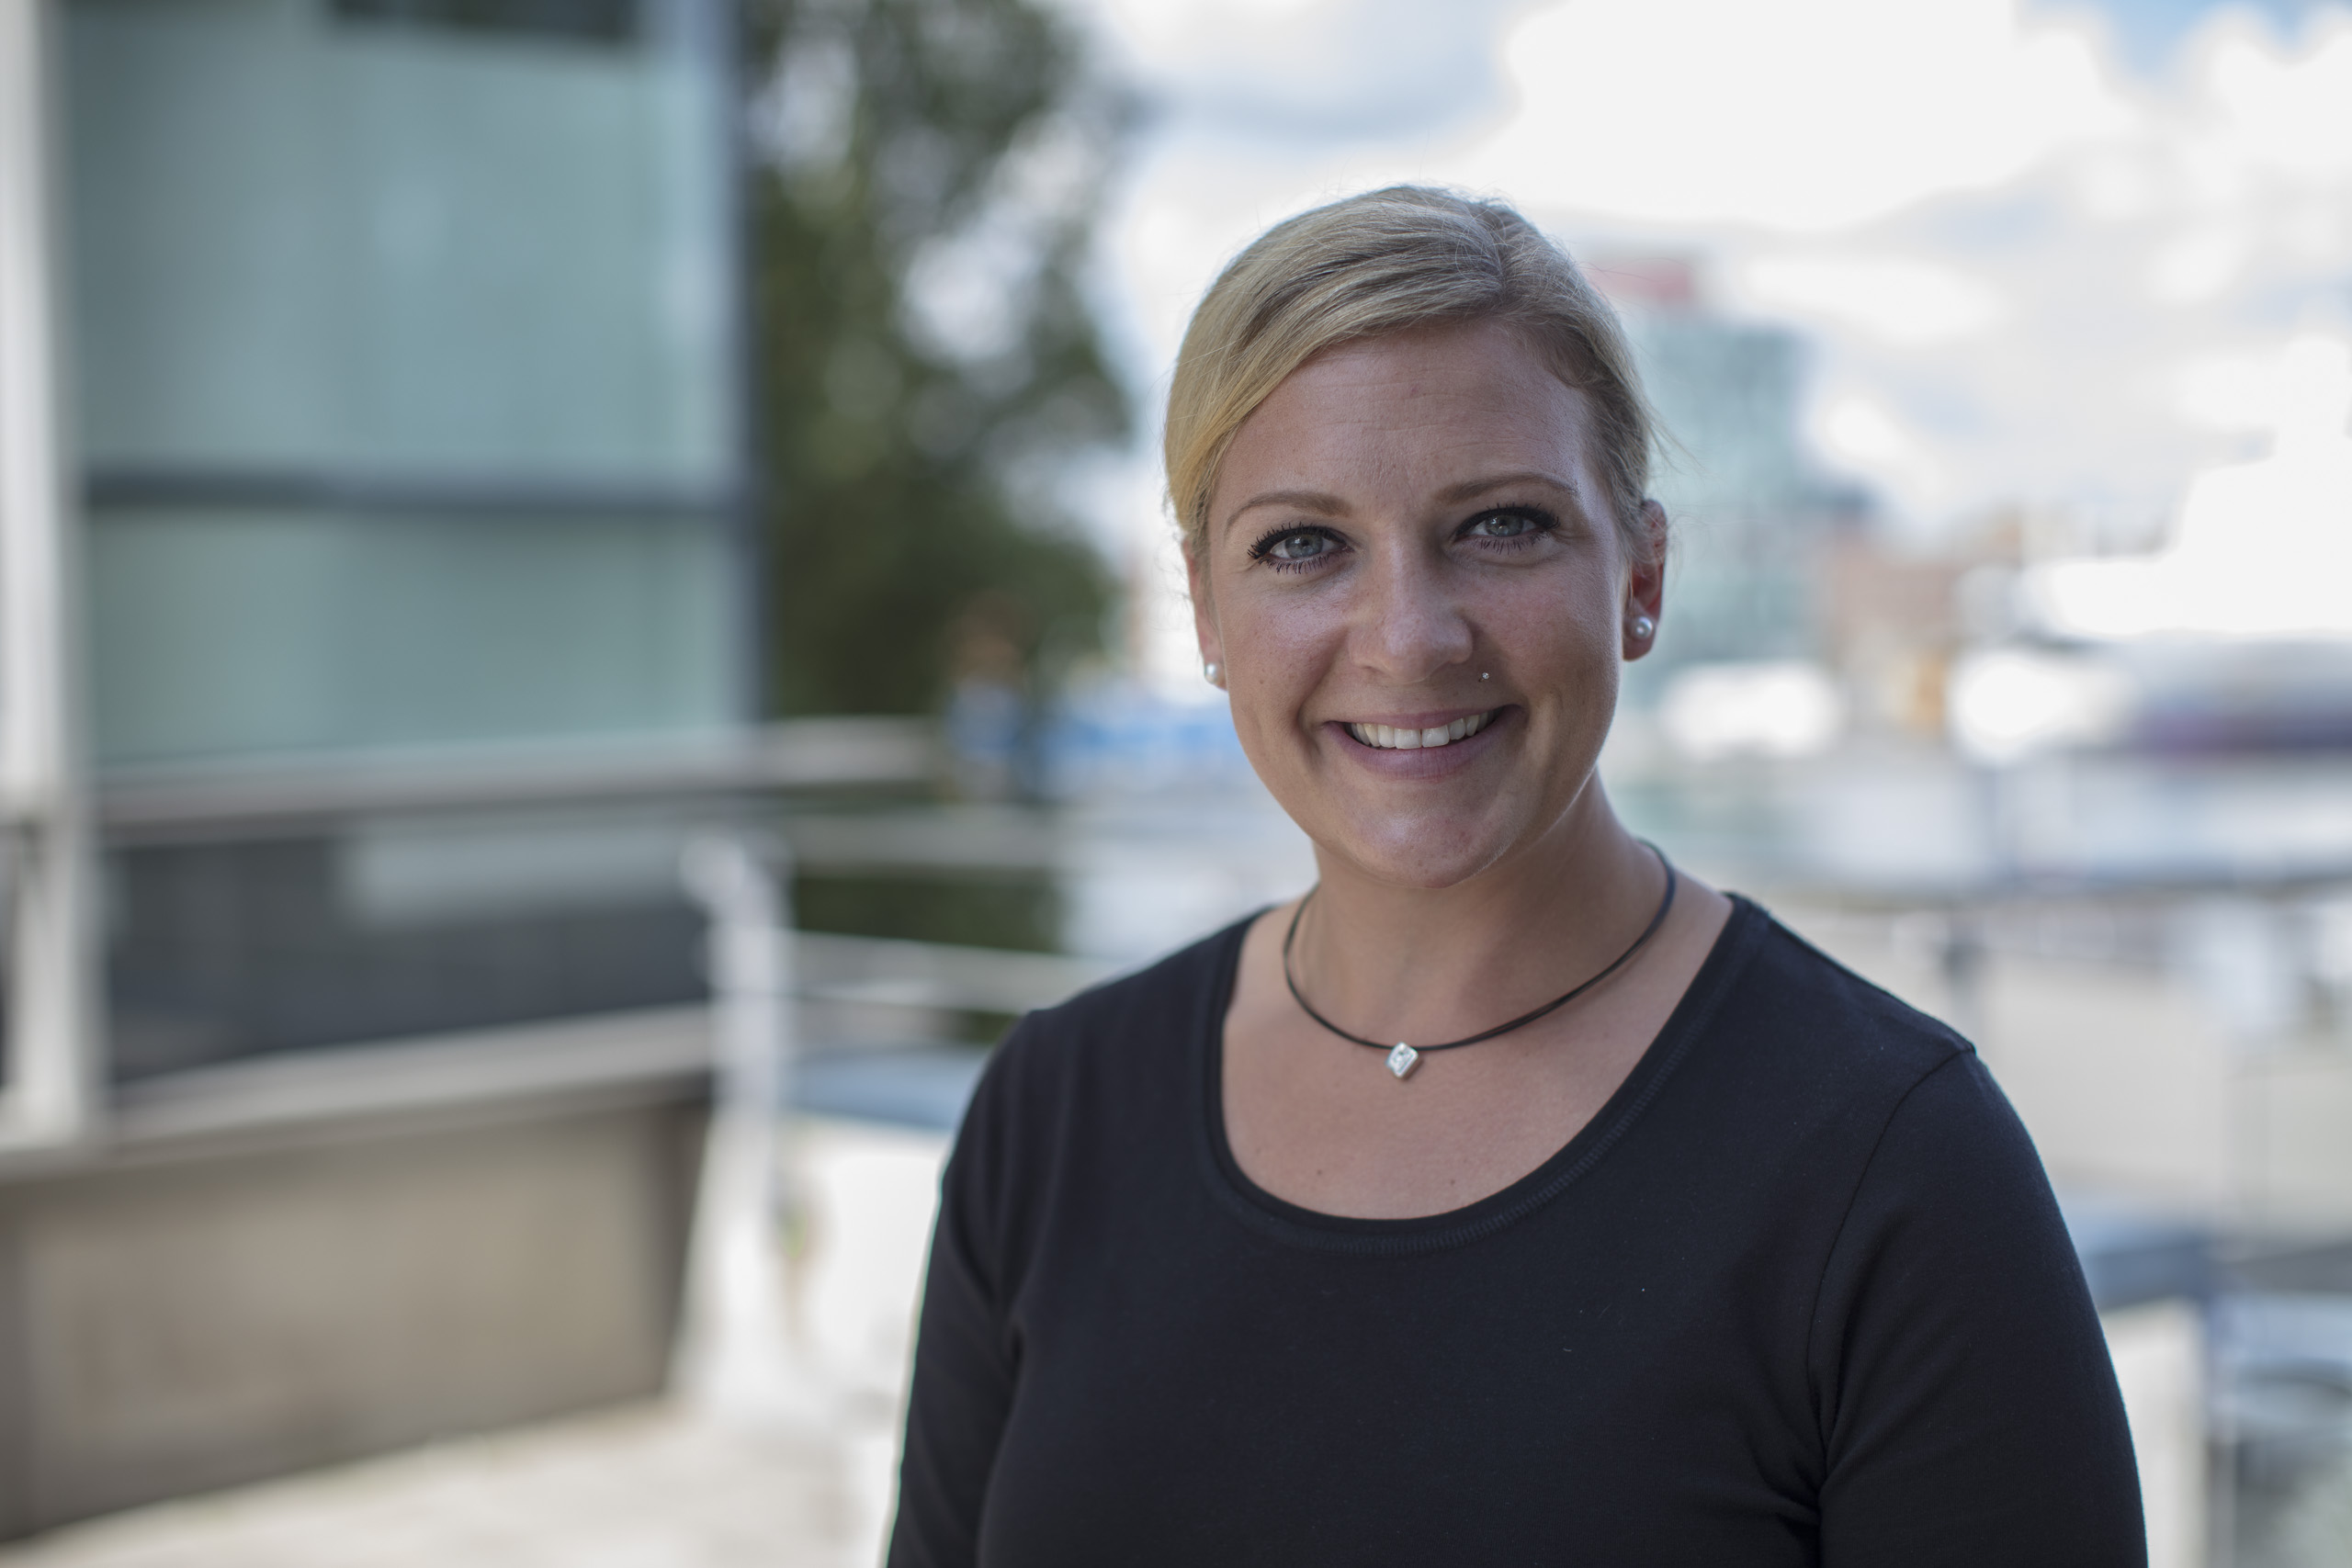 Melanie Krüger